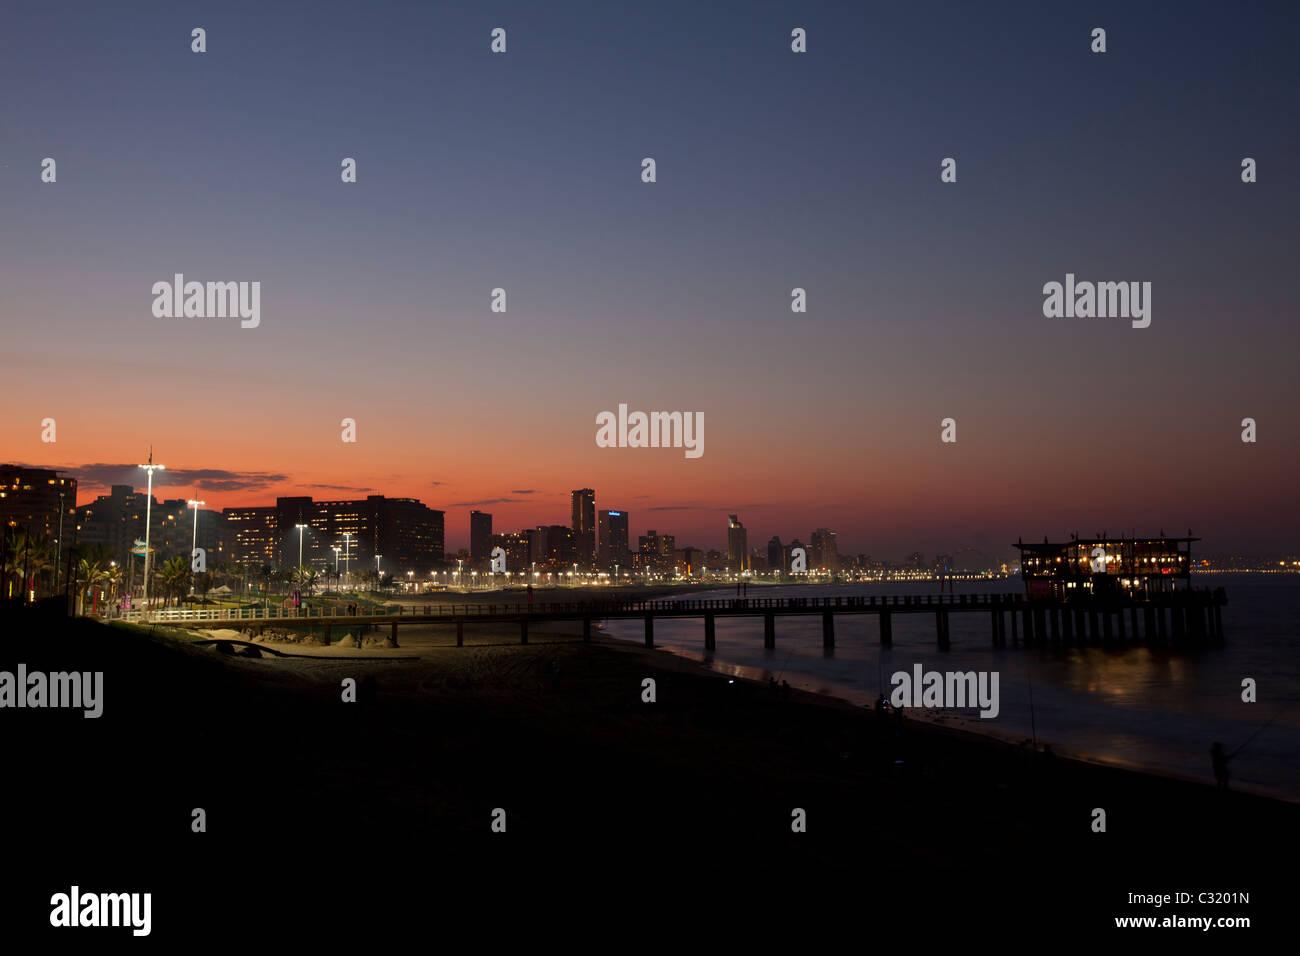 The Golden Mile at dusk, Durban, KwaZulu-Natal, South Africa - Stock Image